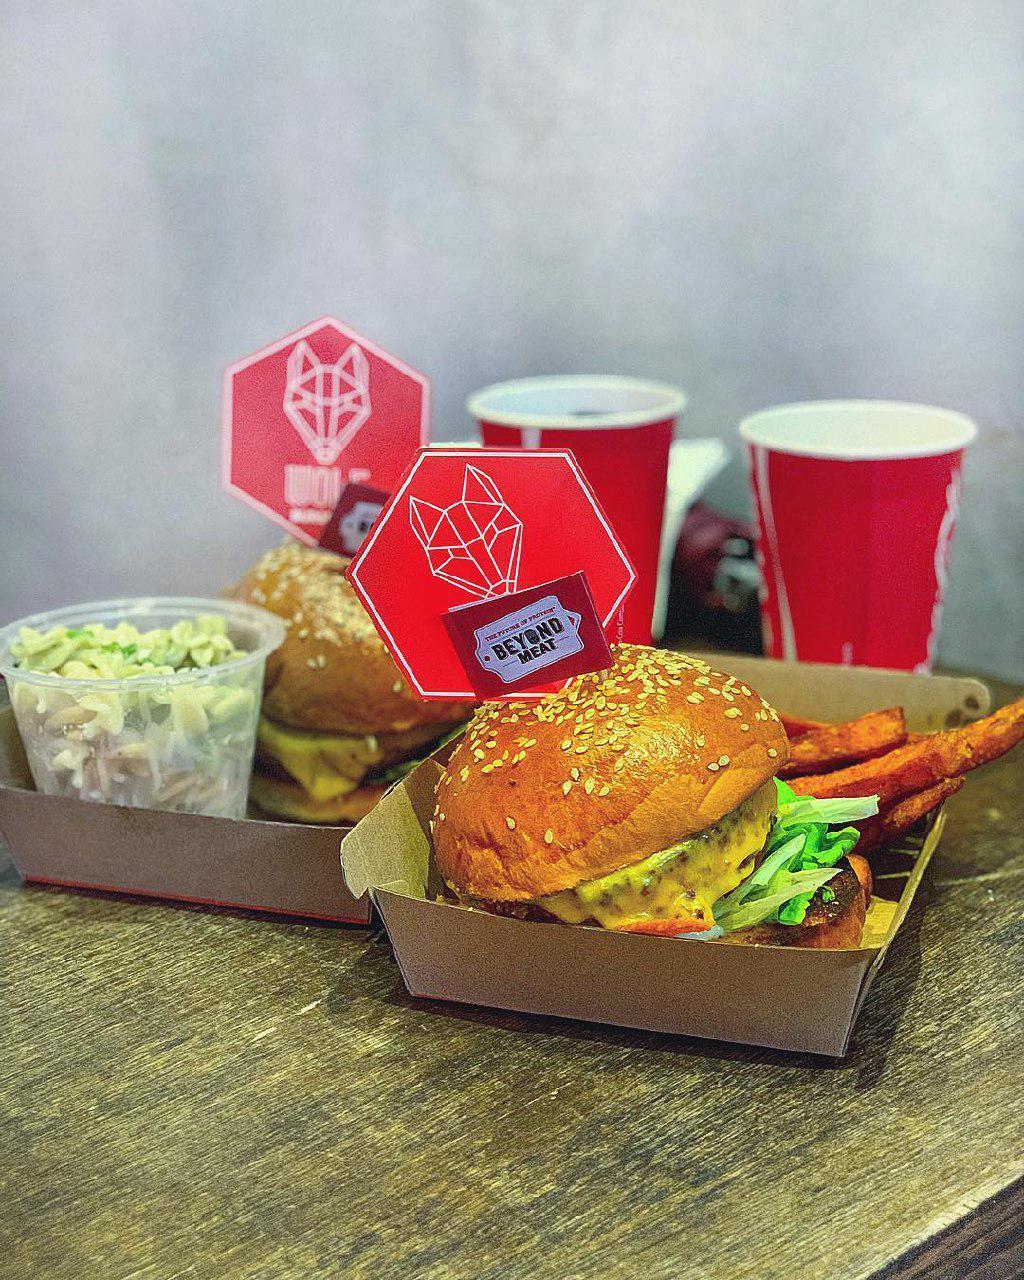 Wolf Burgers serve beyond burgers